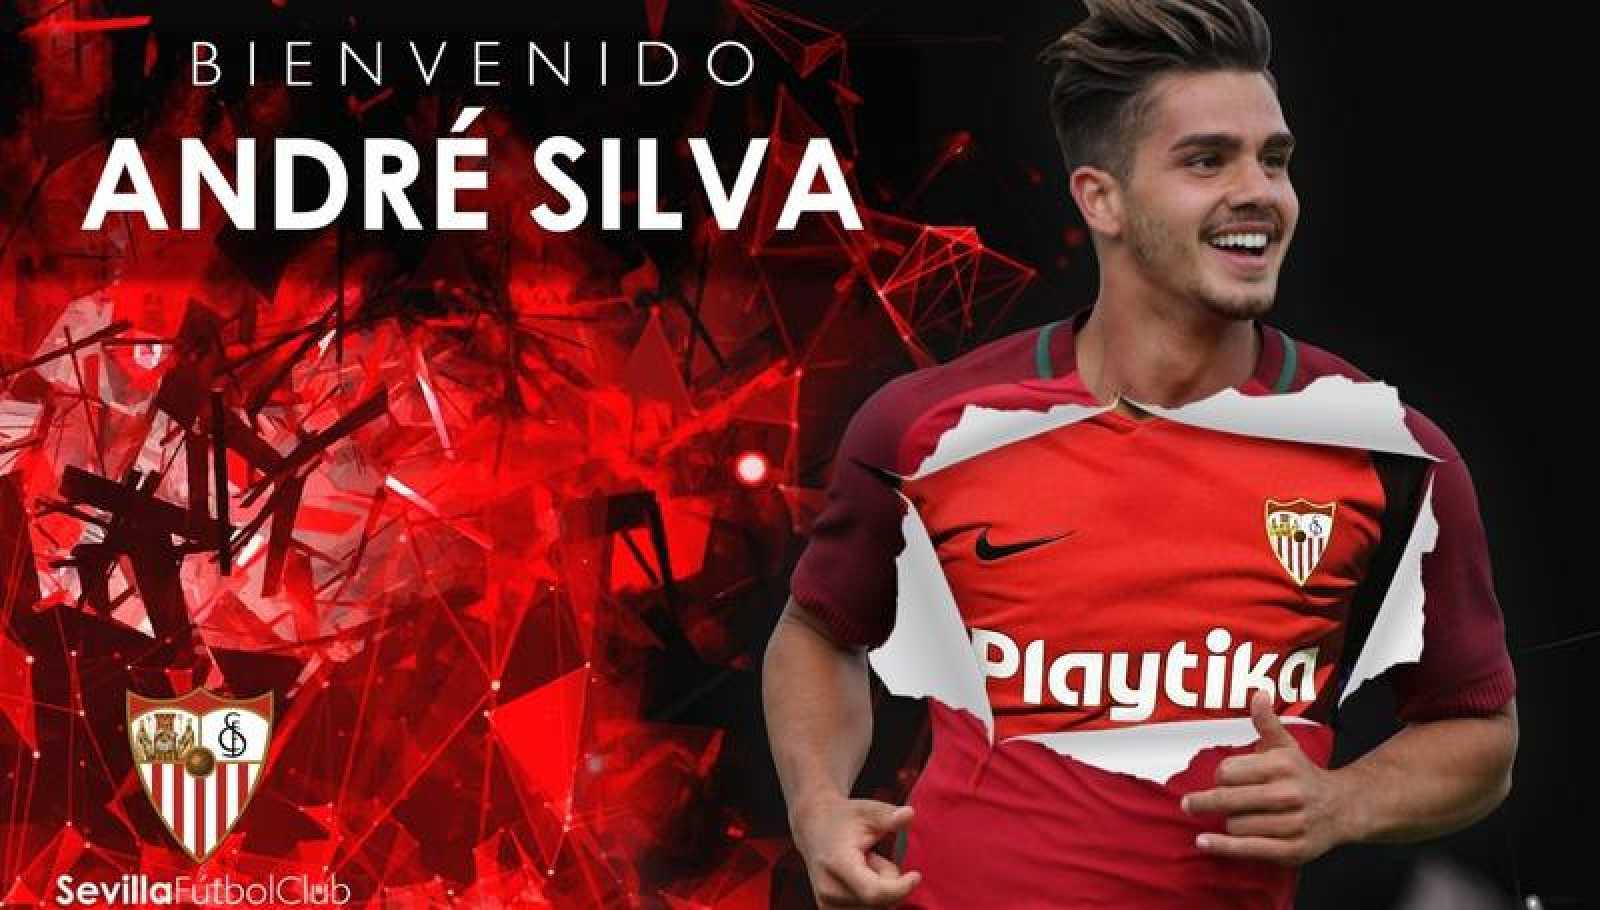 Imagen del anuncio de André Silva en la web del Sevilla.